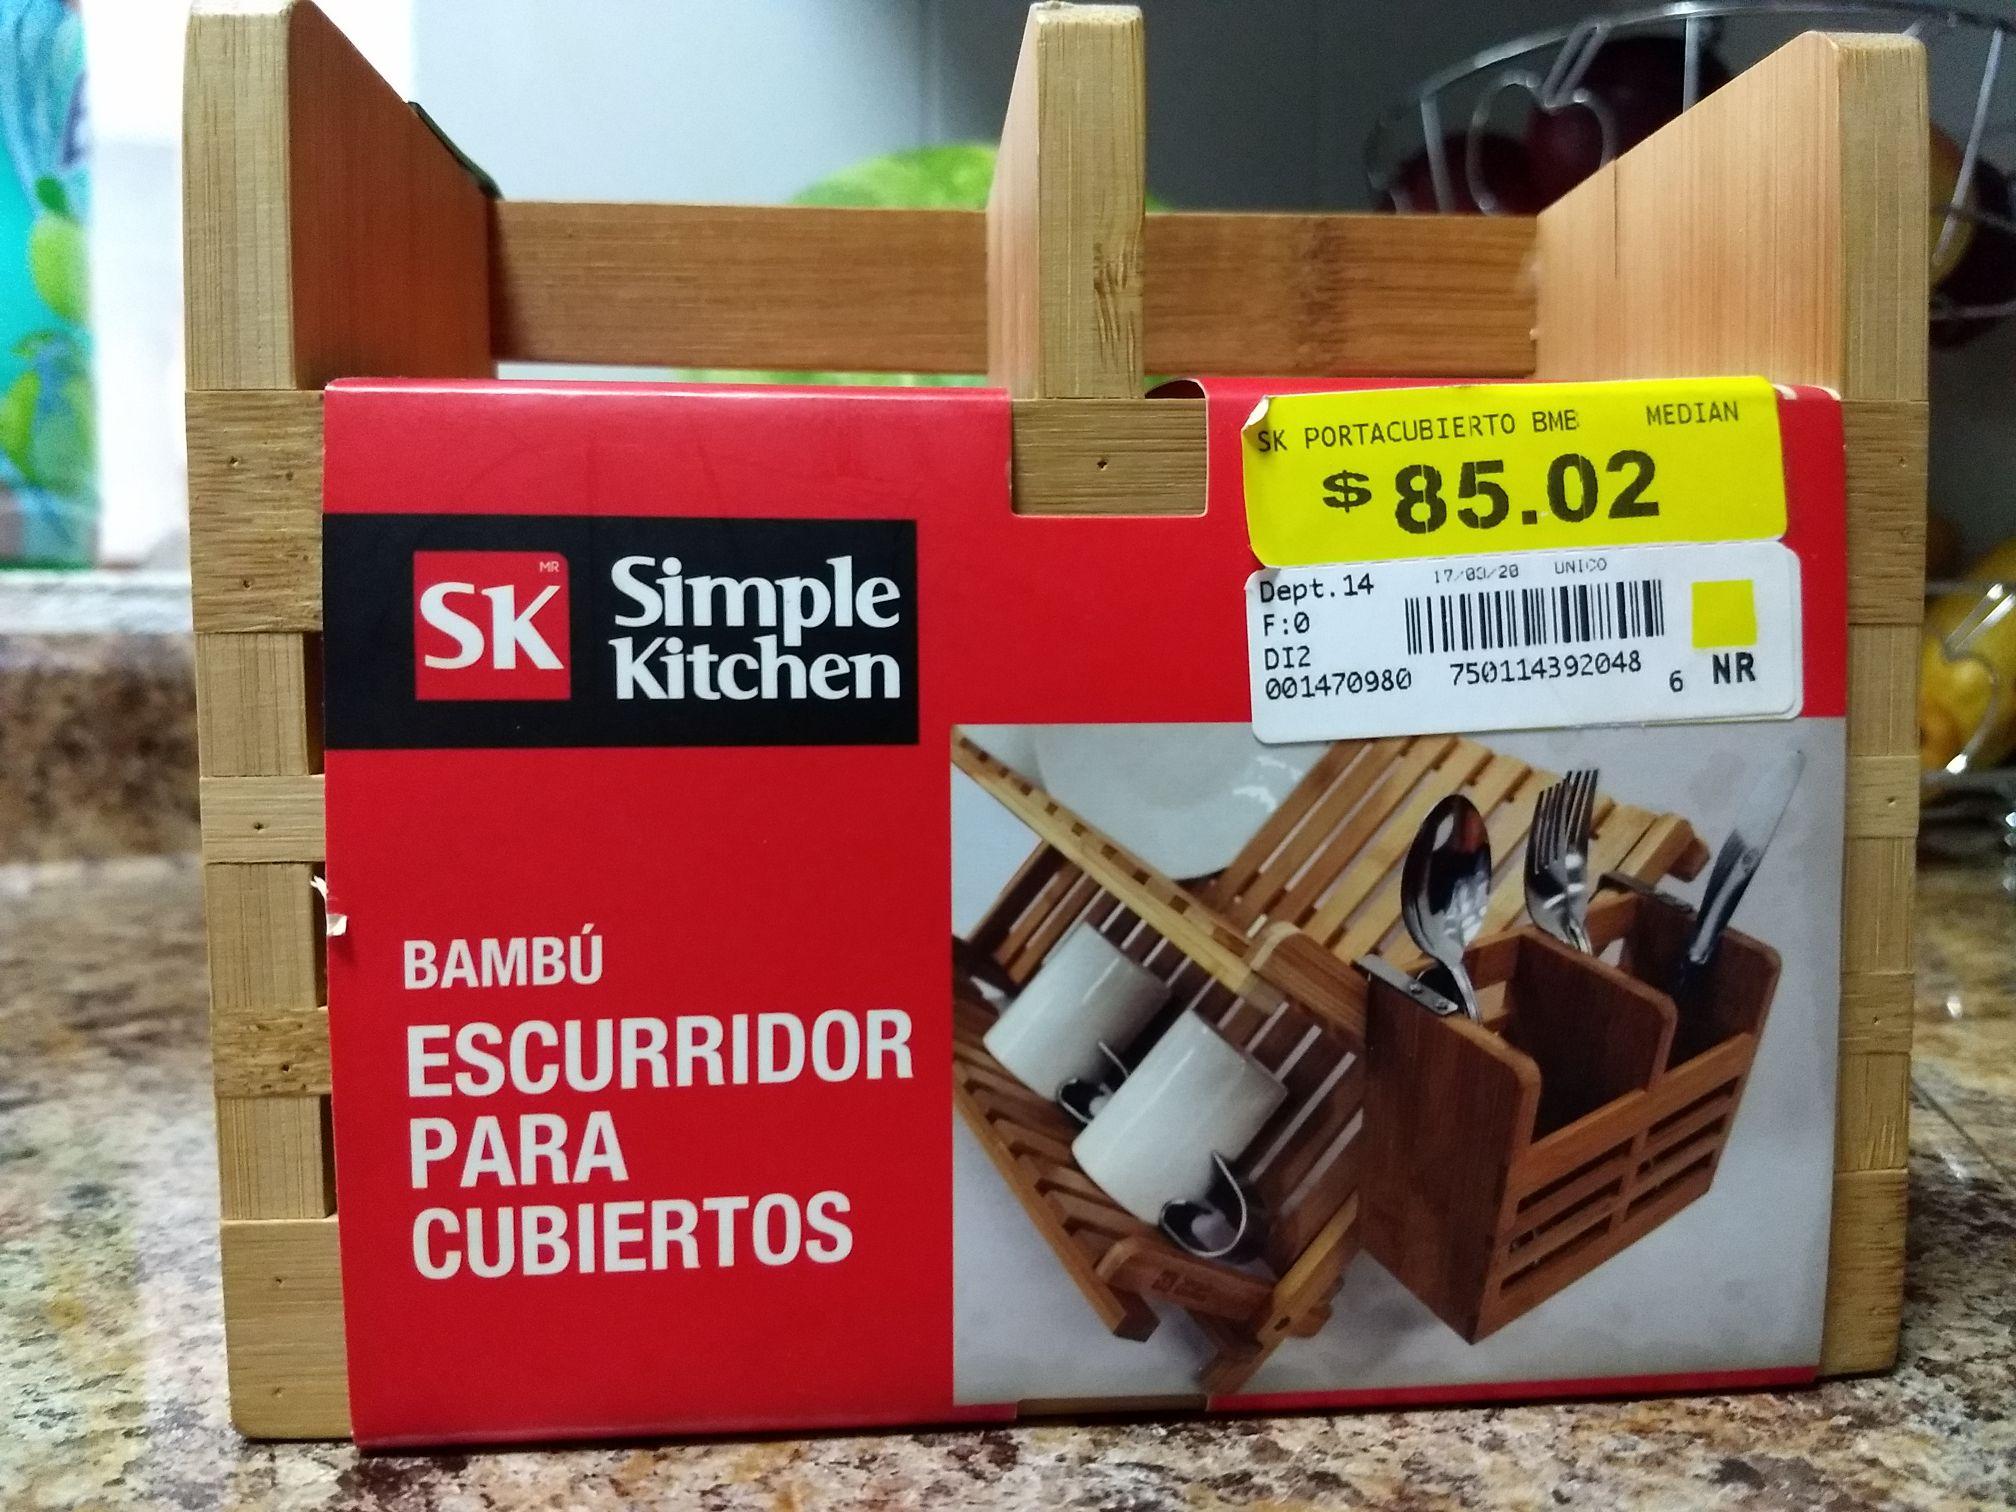 Walmart: Escurridor para cubiertos de Bambú Simple Kitchen